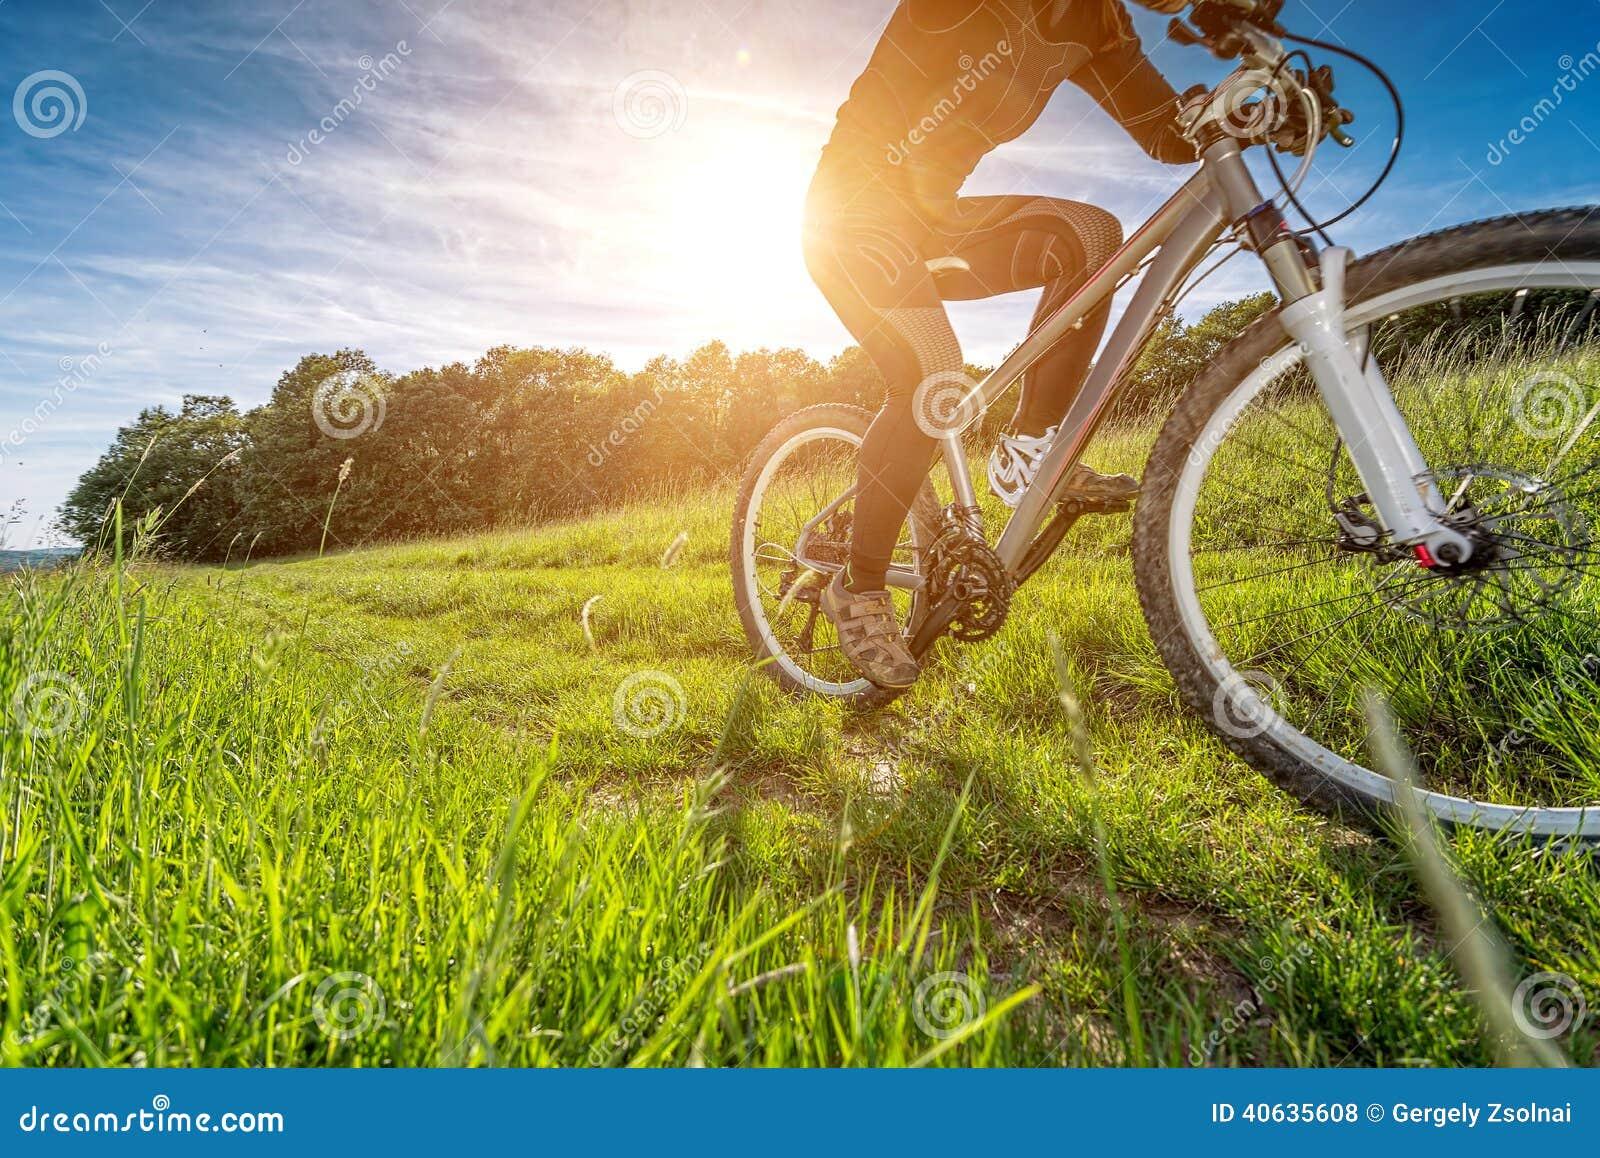 Sport bike, cycling in the beautiful meadow, detail photo